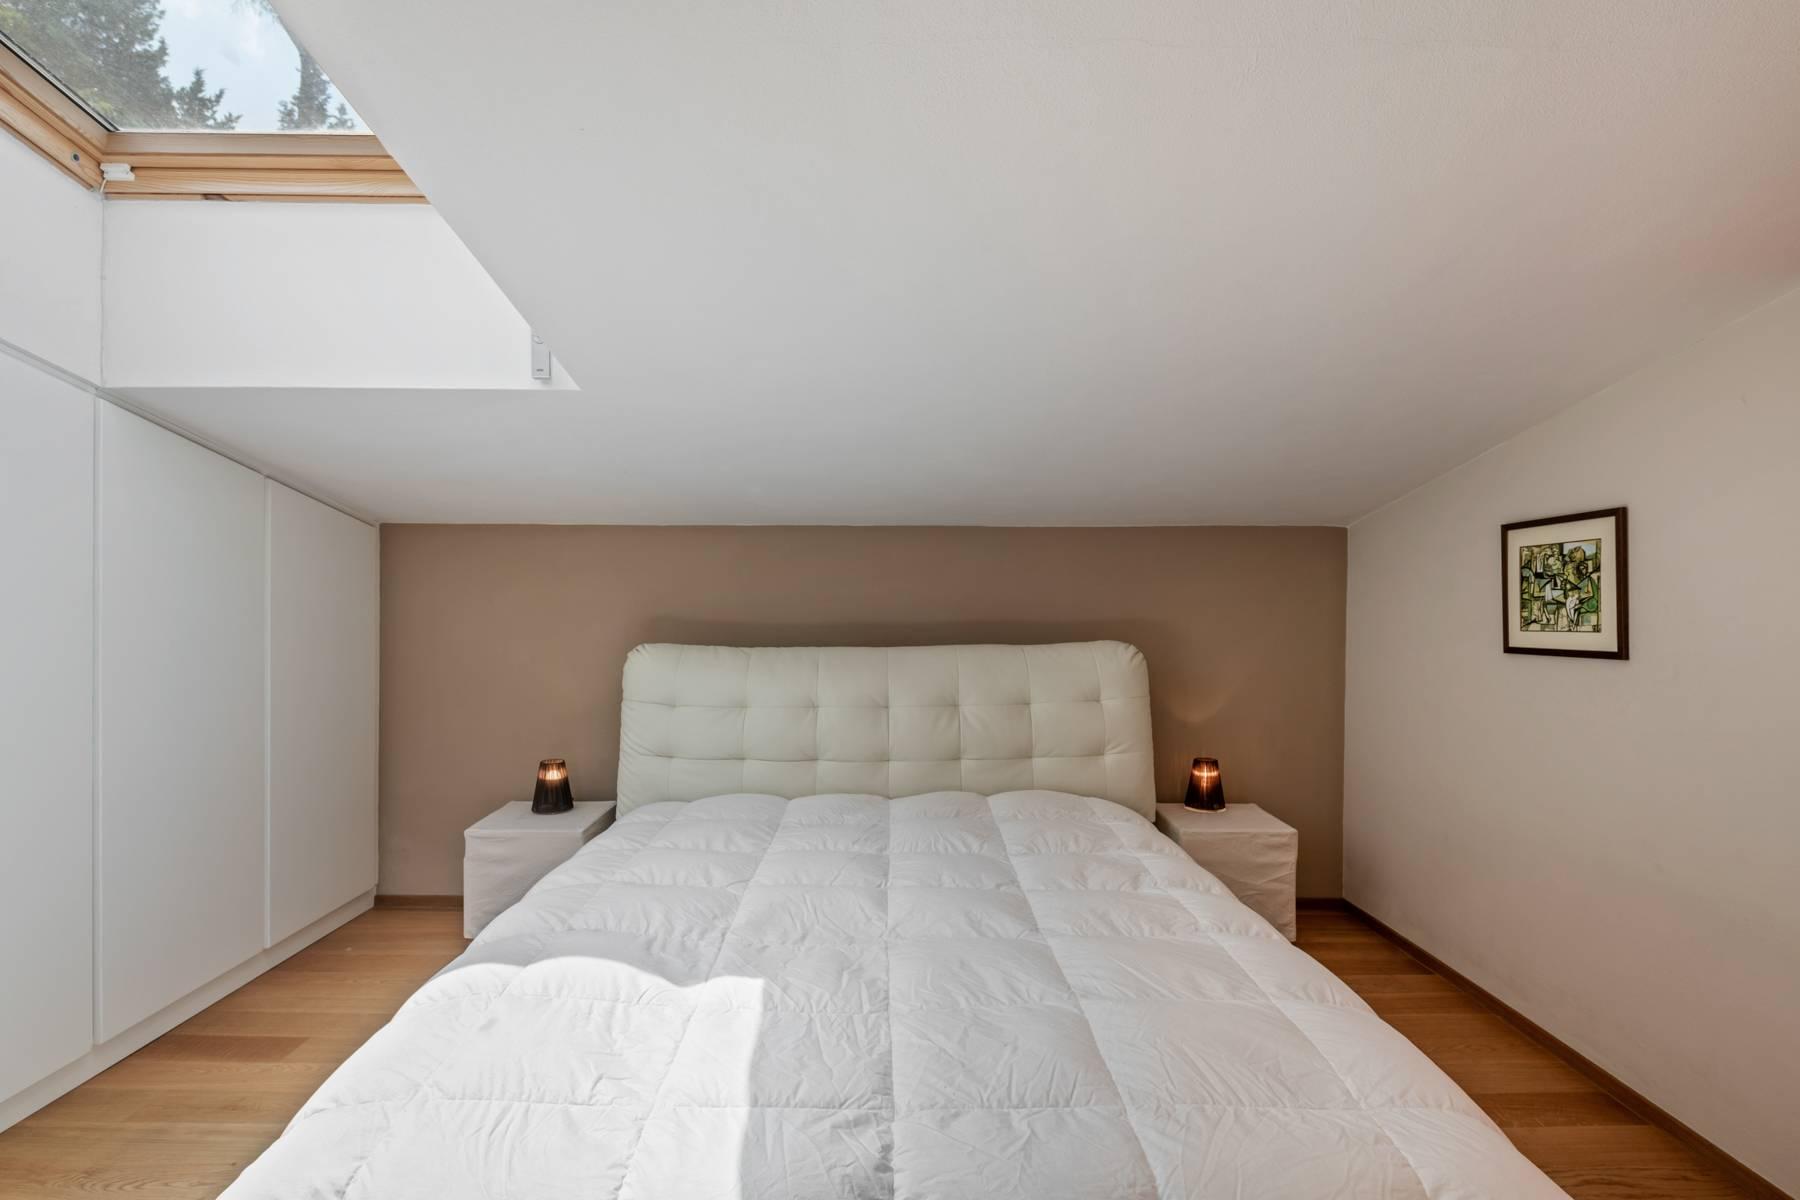 Appartamento in Vendita a Pontassieve: 5 locali, 300 mq - Foto 8